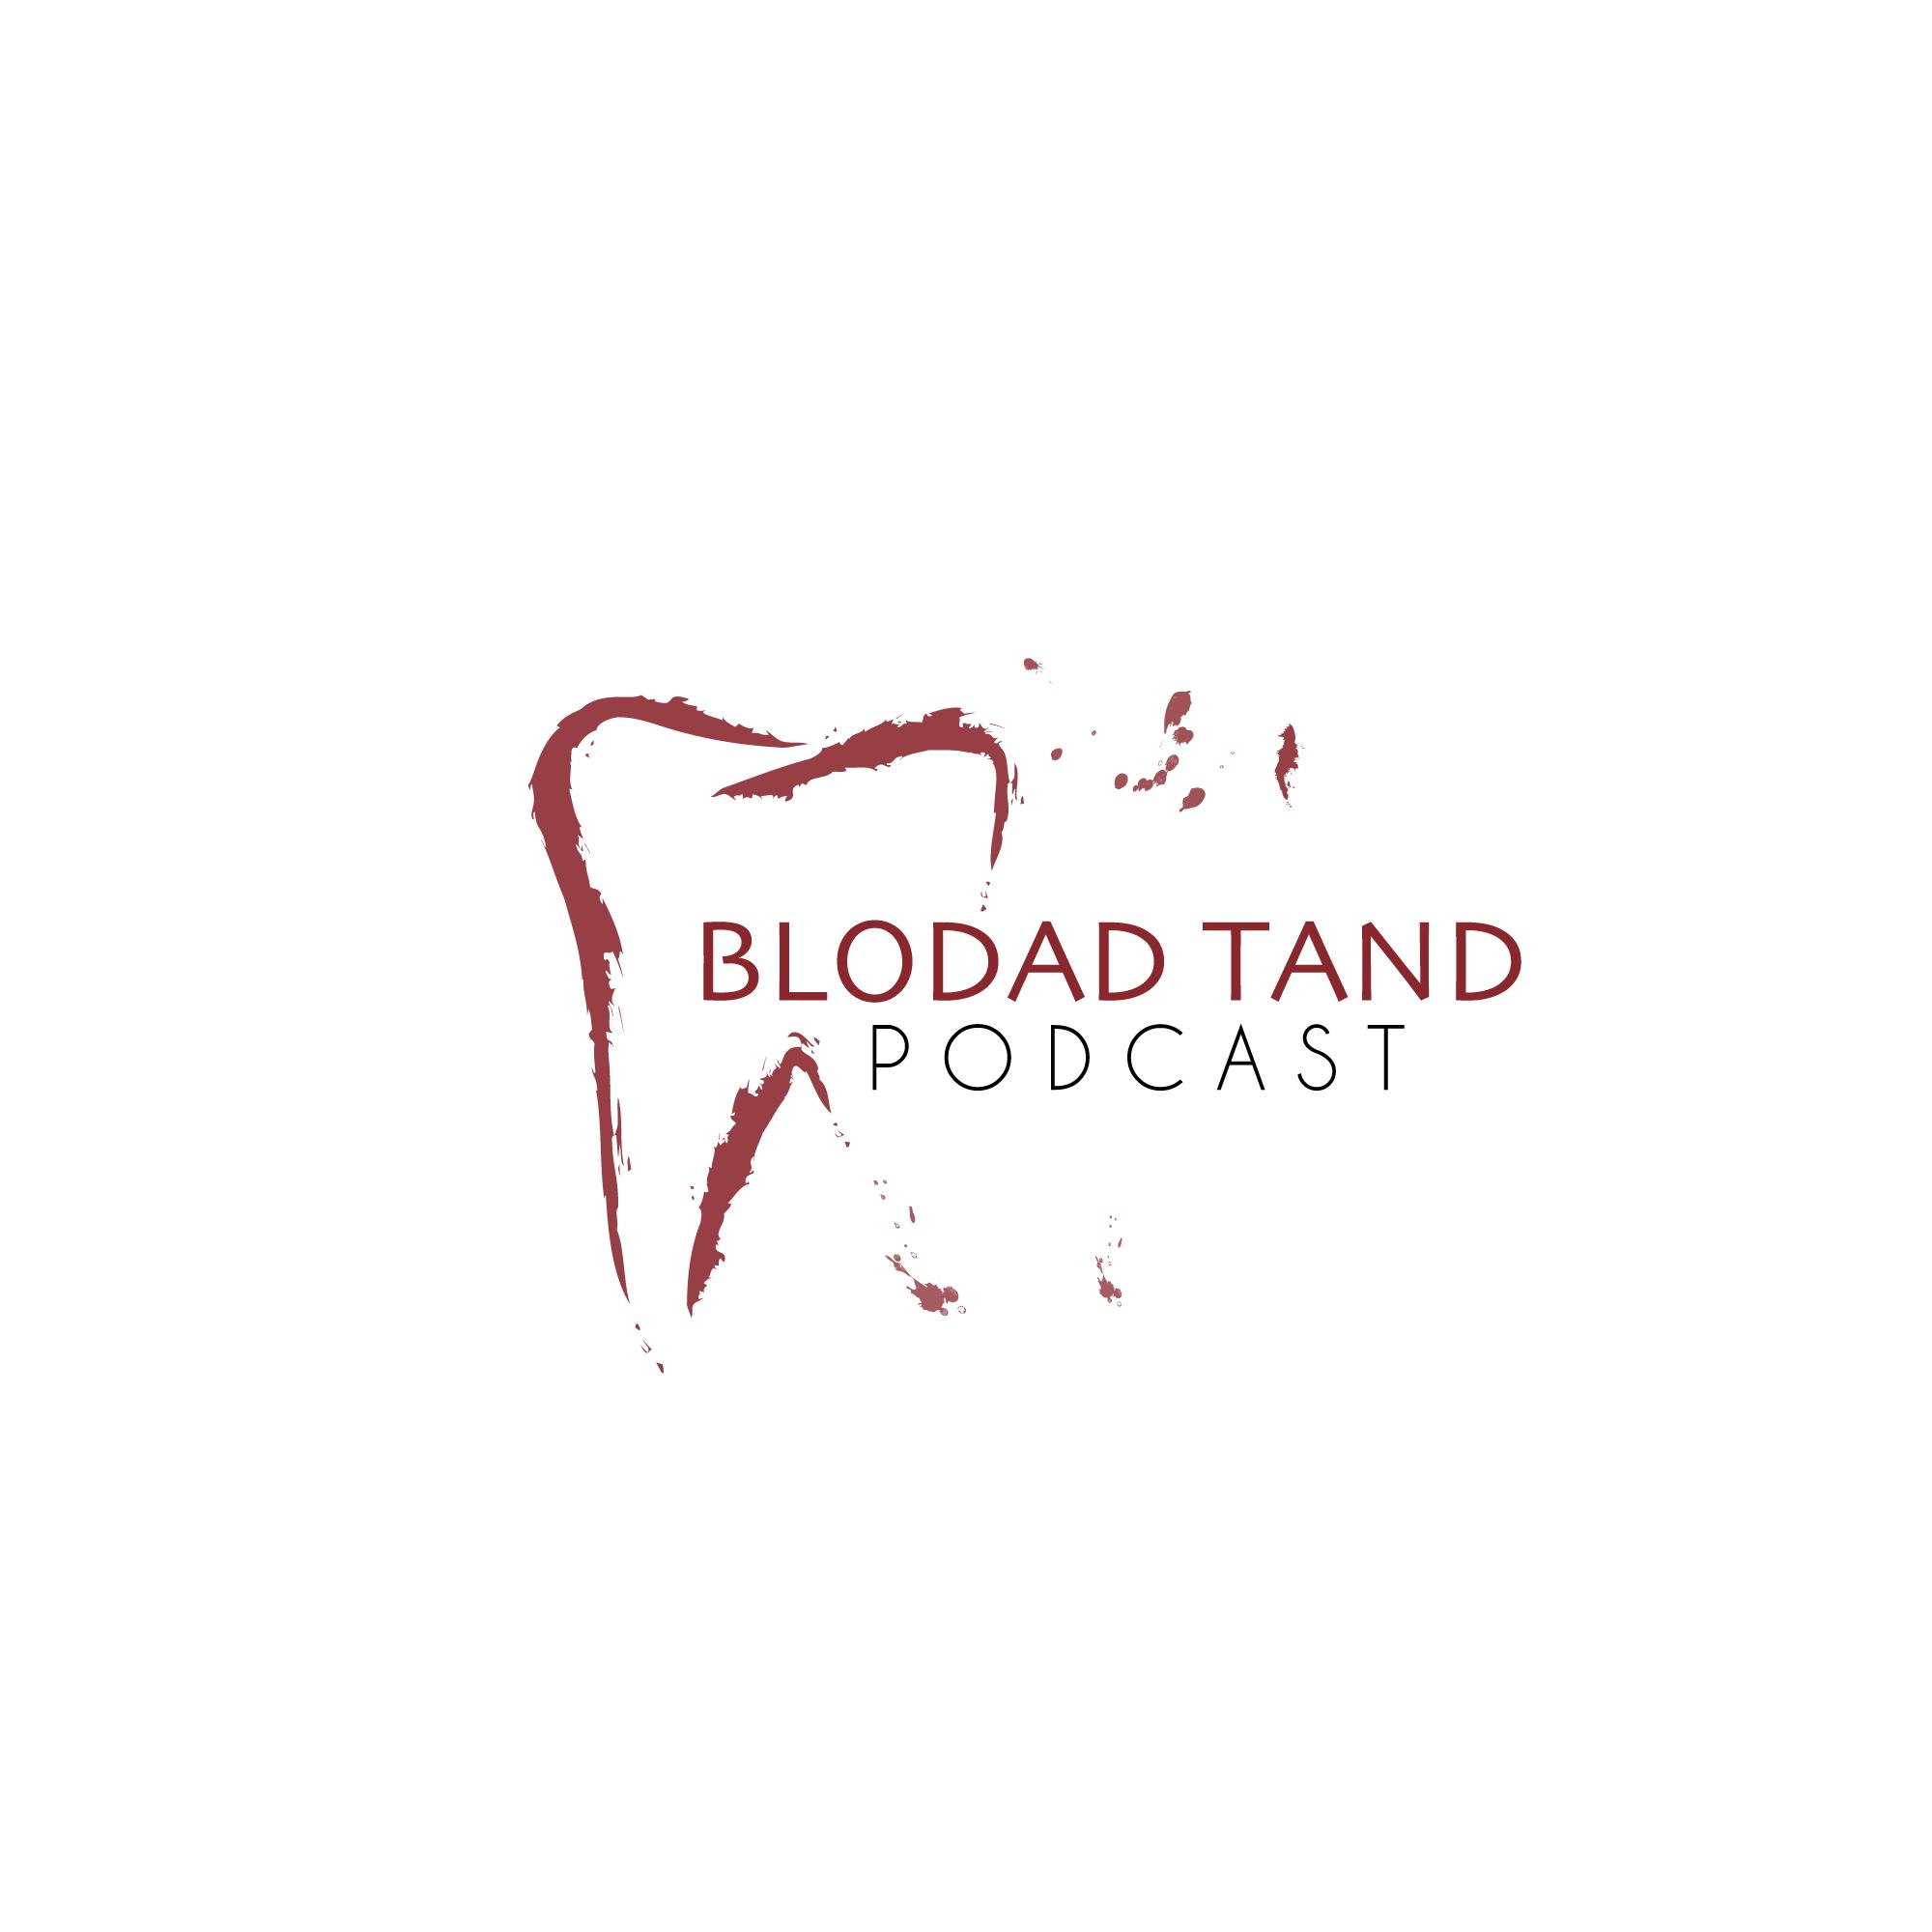 Blodad tand show art